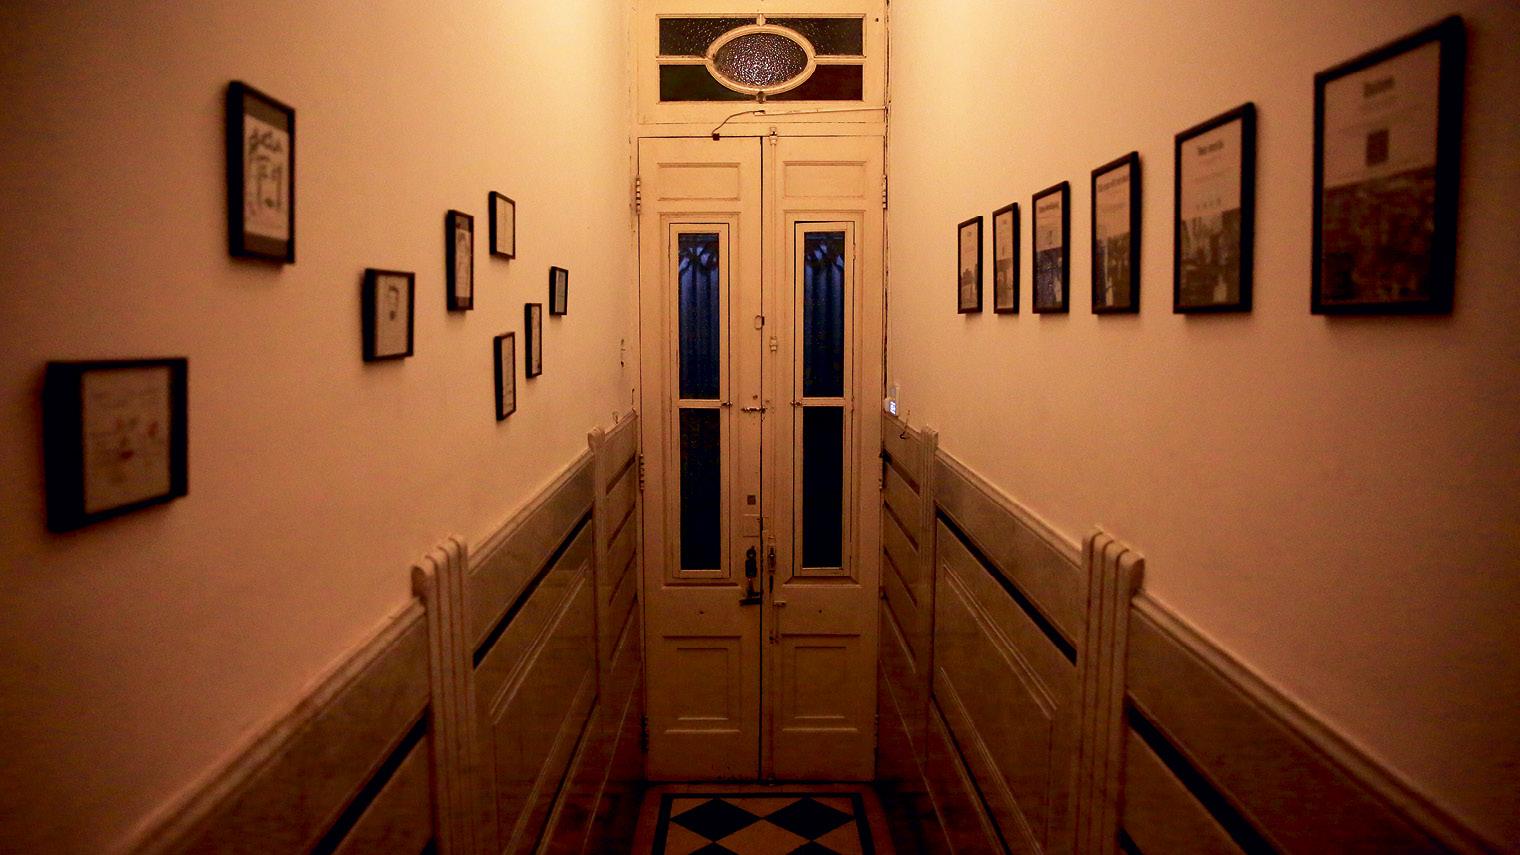 Entrance to Palermo establishment Ocho Once